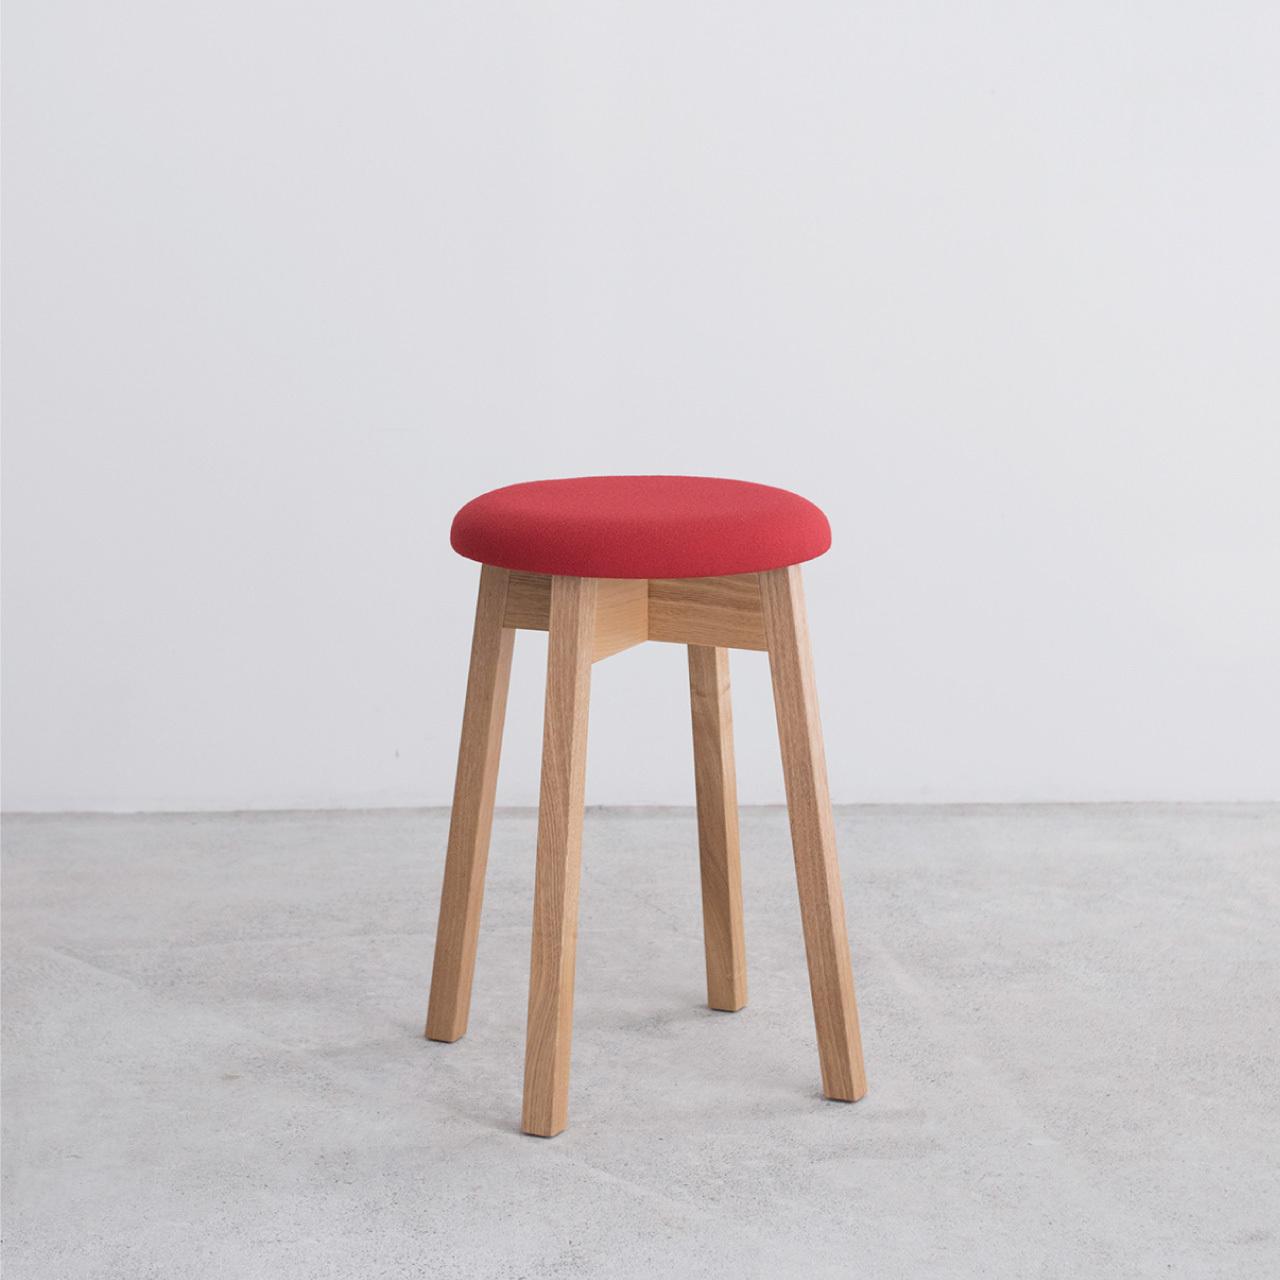 Pico stool